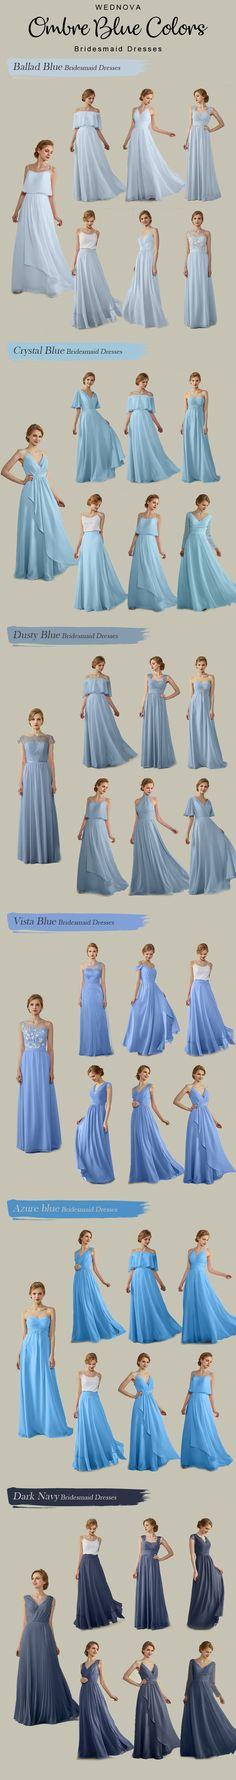 Ombre blue bridesmaid dresses different style dresses long suitable for different bridesmaid #bridesmaids blue bridesmaid dresses | blue bridesmaid dresses long | long dresses classy |v neck dresses | v neck dresses formal